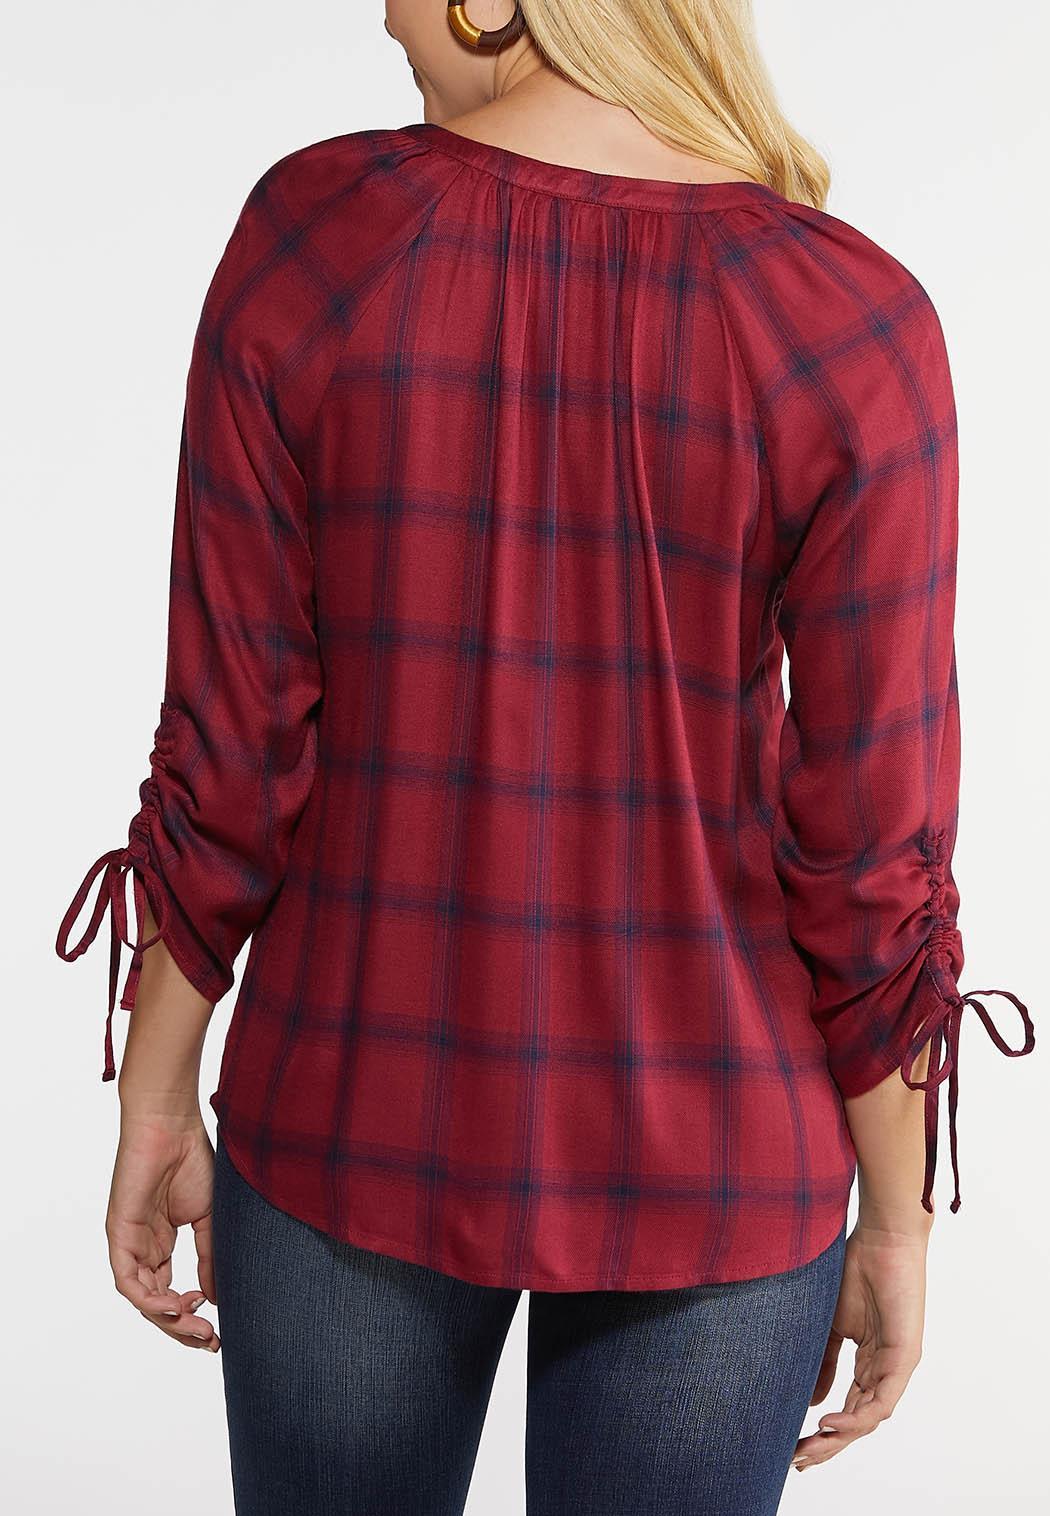 Plaid Scrunch Sleeve Top (Item #43999334)